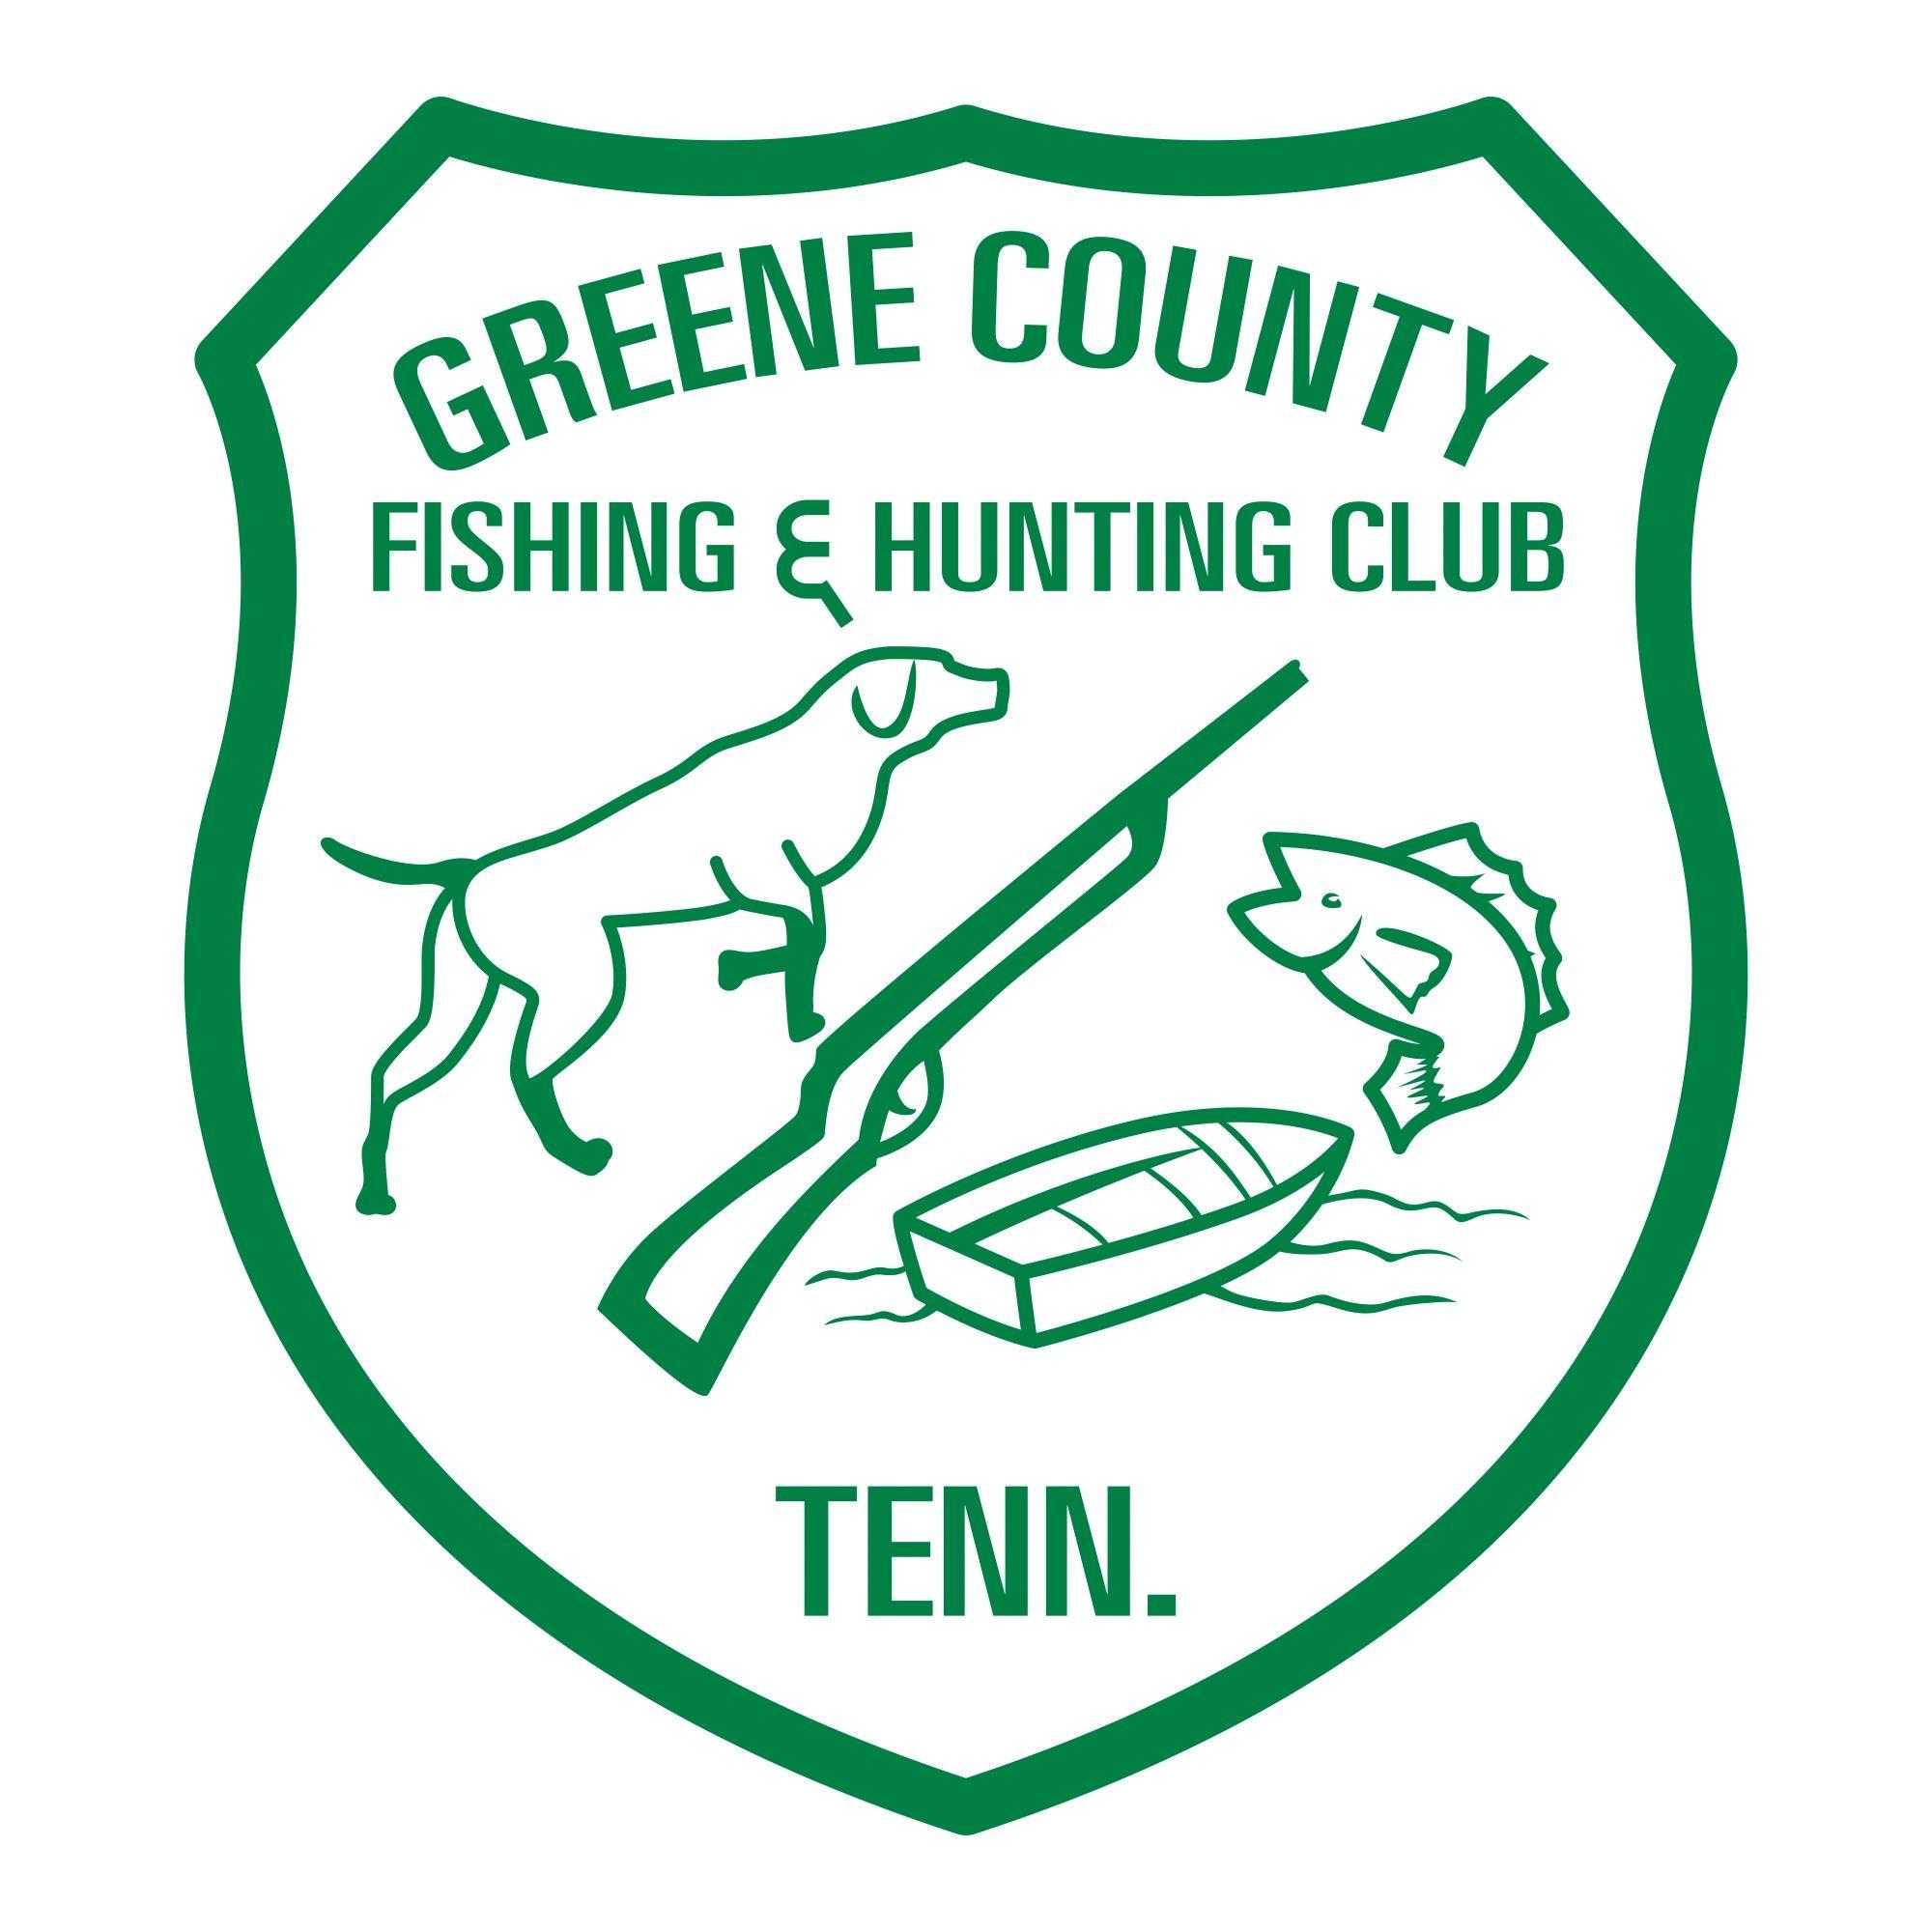 Greene County Fishing And Hunting Club